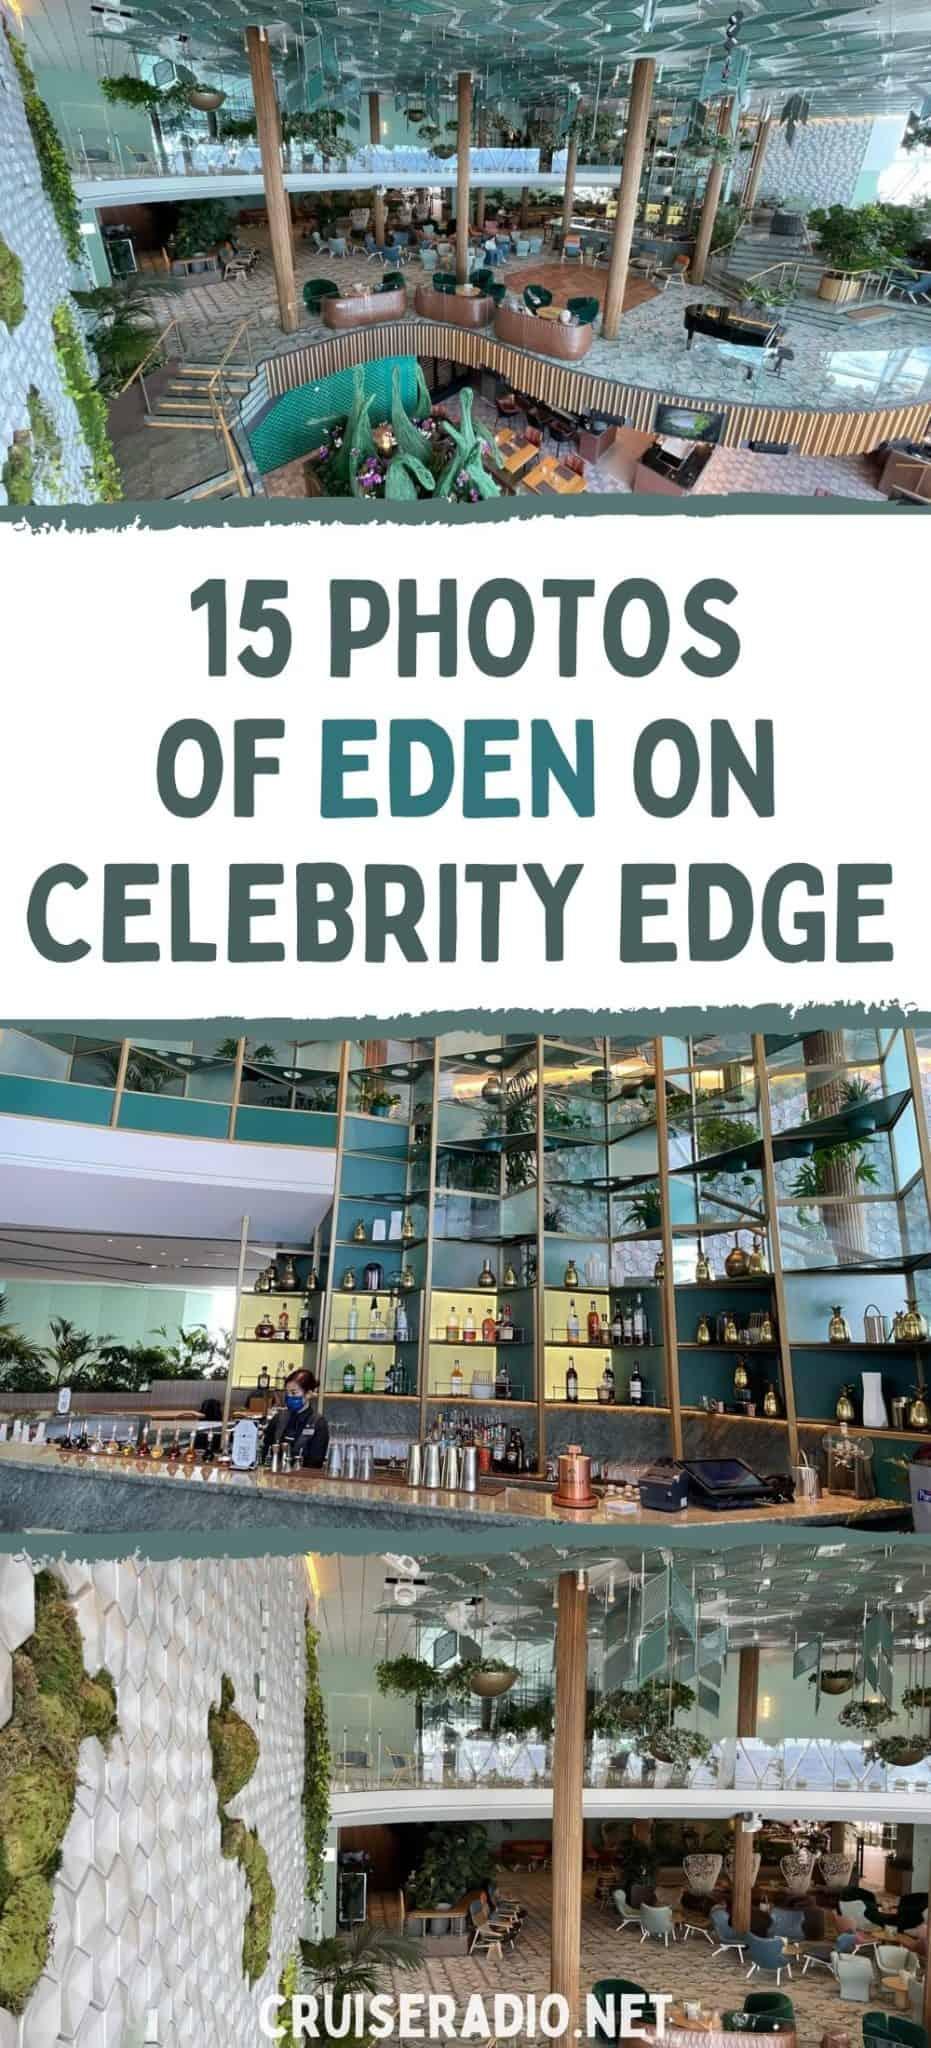 15 photos of eden on celebrity edge